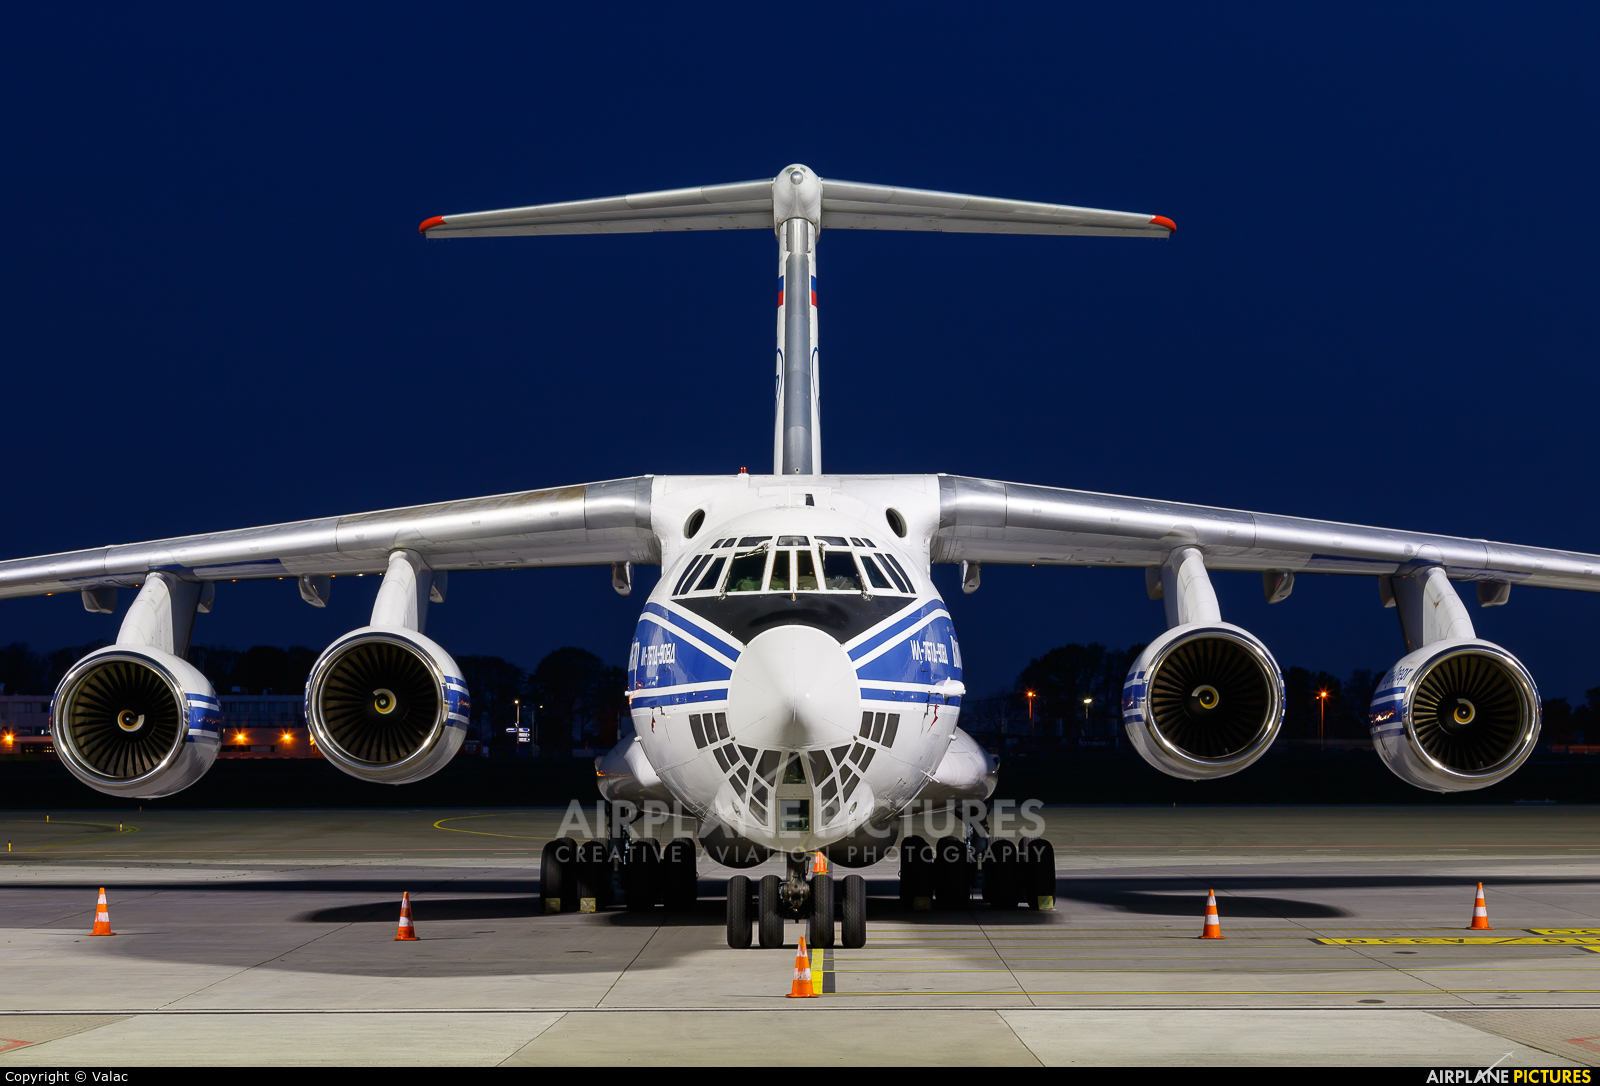 Volga Dnepr Airlines RA-76511 aircraft at Maastricht - Aachen